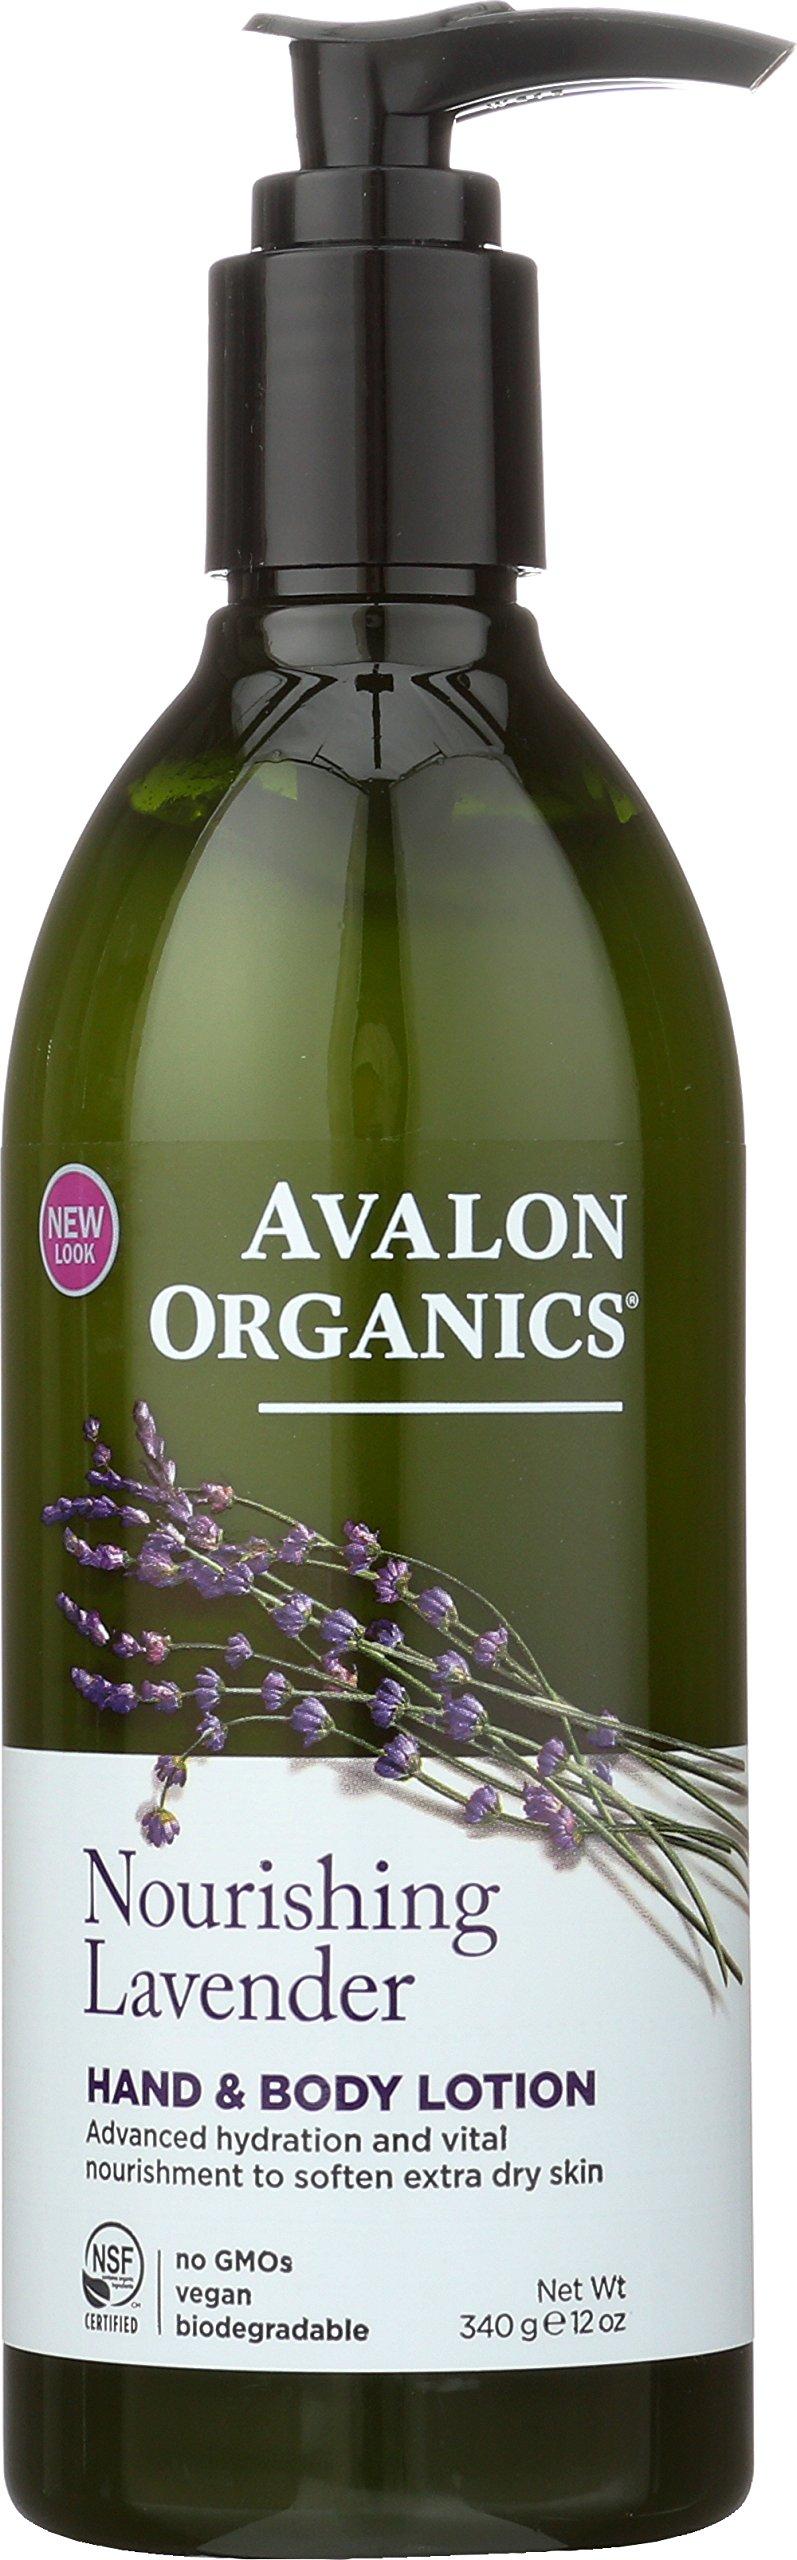 Avalon Organics Hand & Body Lotion, Nourishing Lavender, 12 Ounce